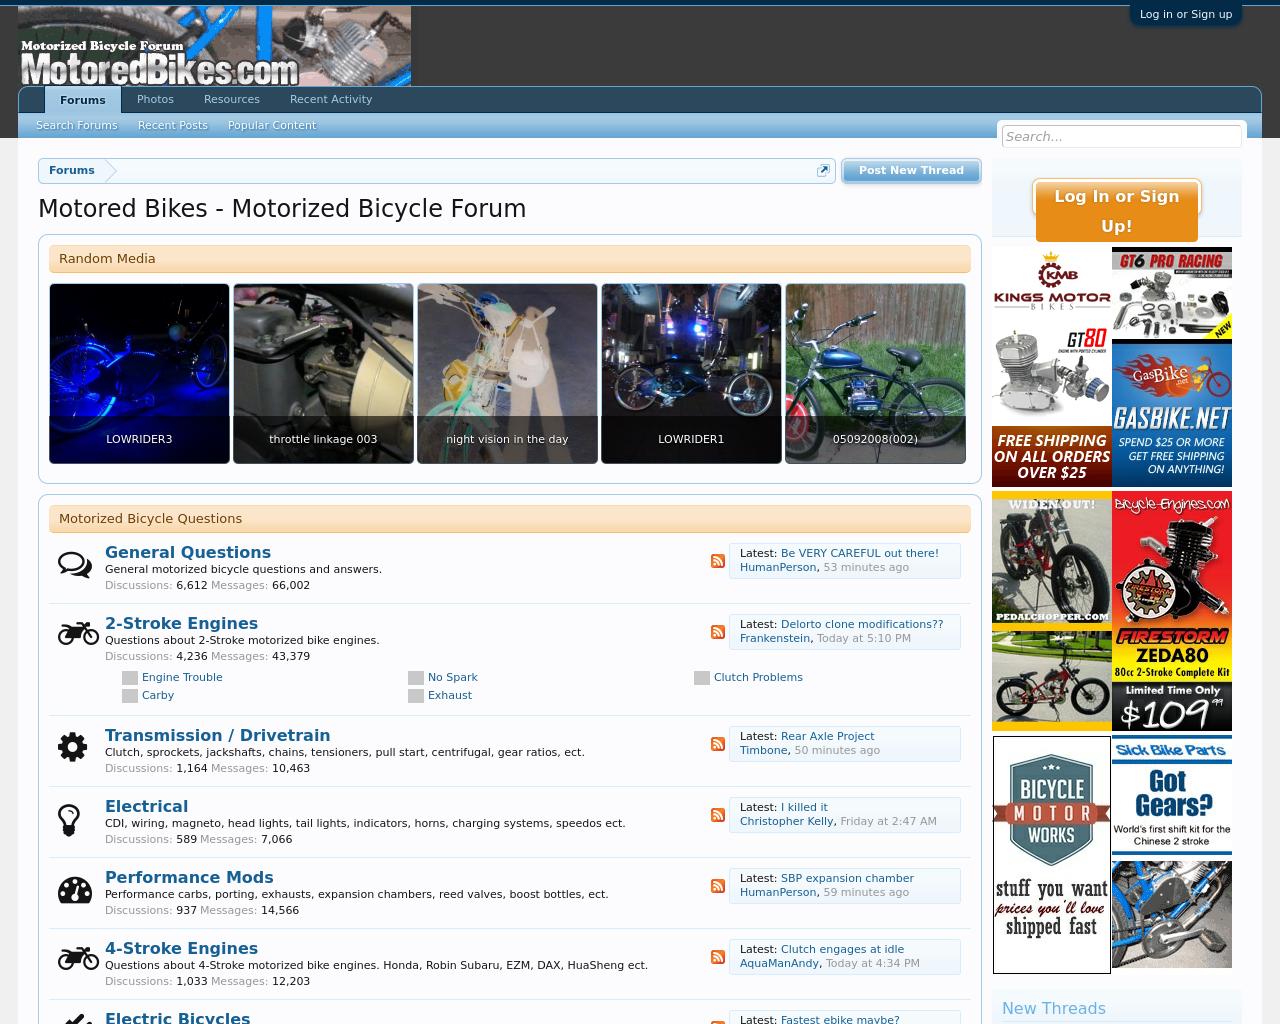 Motorized-Bicycle-Forum-Advertising-Reviews-Pricing